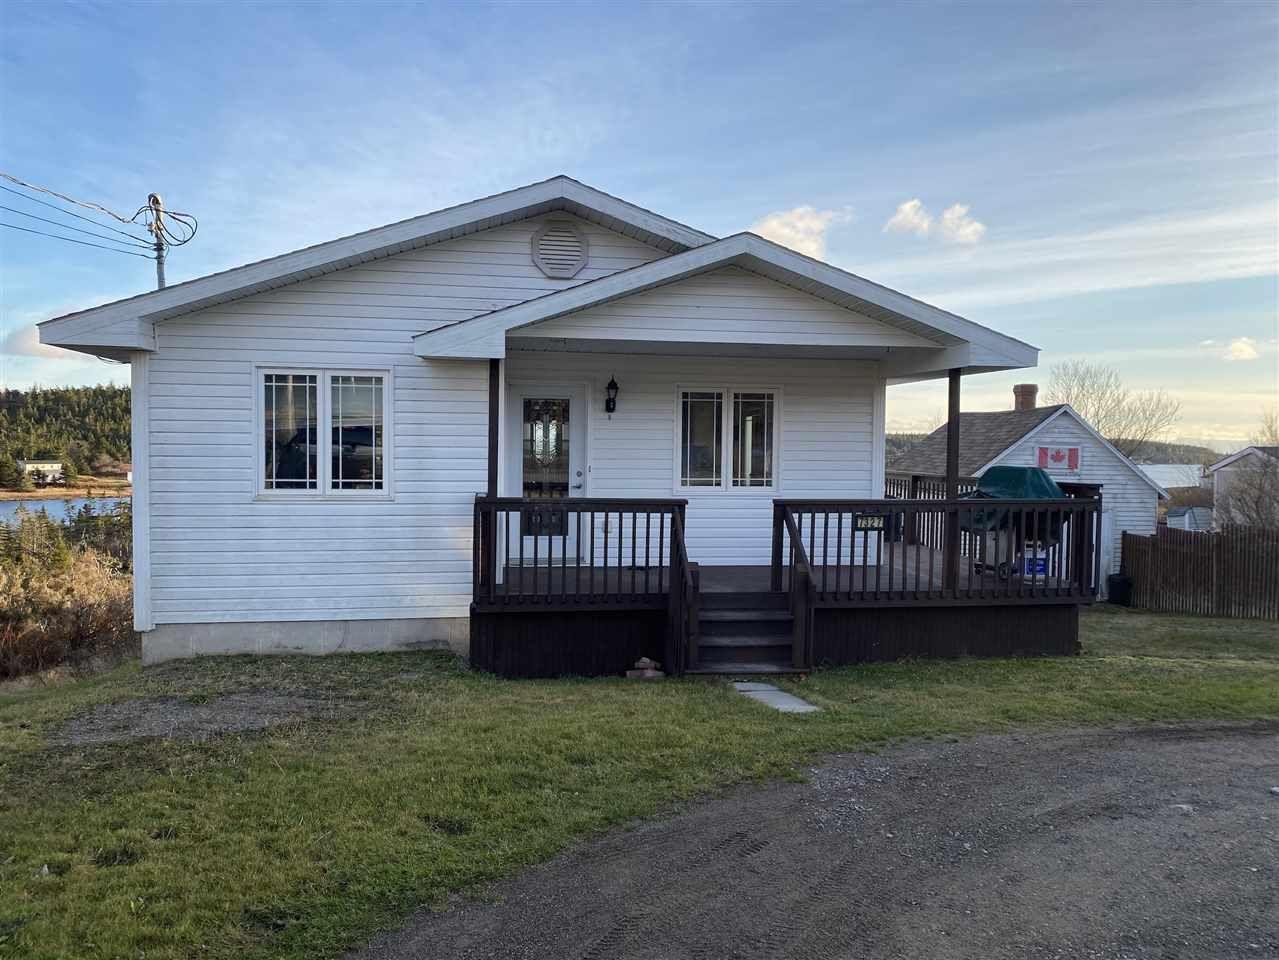 Photo 1: Photos: 7327 Main Street in Louisbourg: 206-Louisbourg Residential for sale (Cape Breton)  : MLS®# 202025505